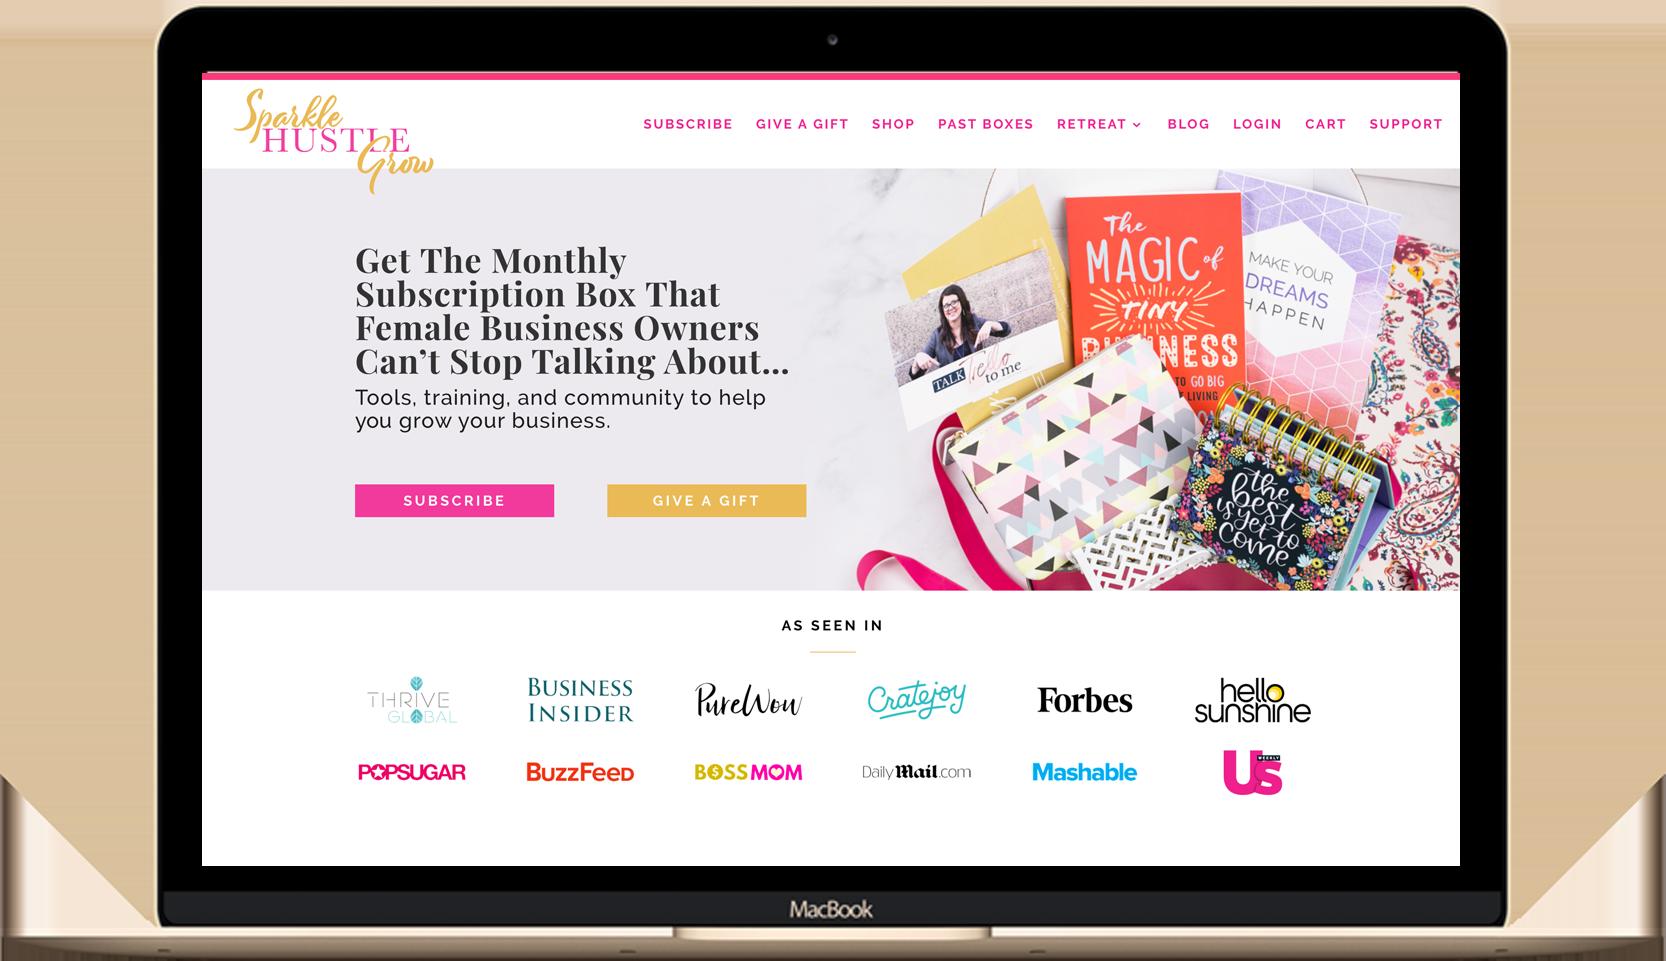 sparkle hustle grow website